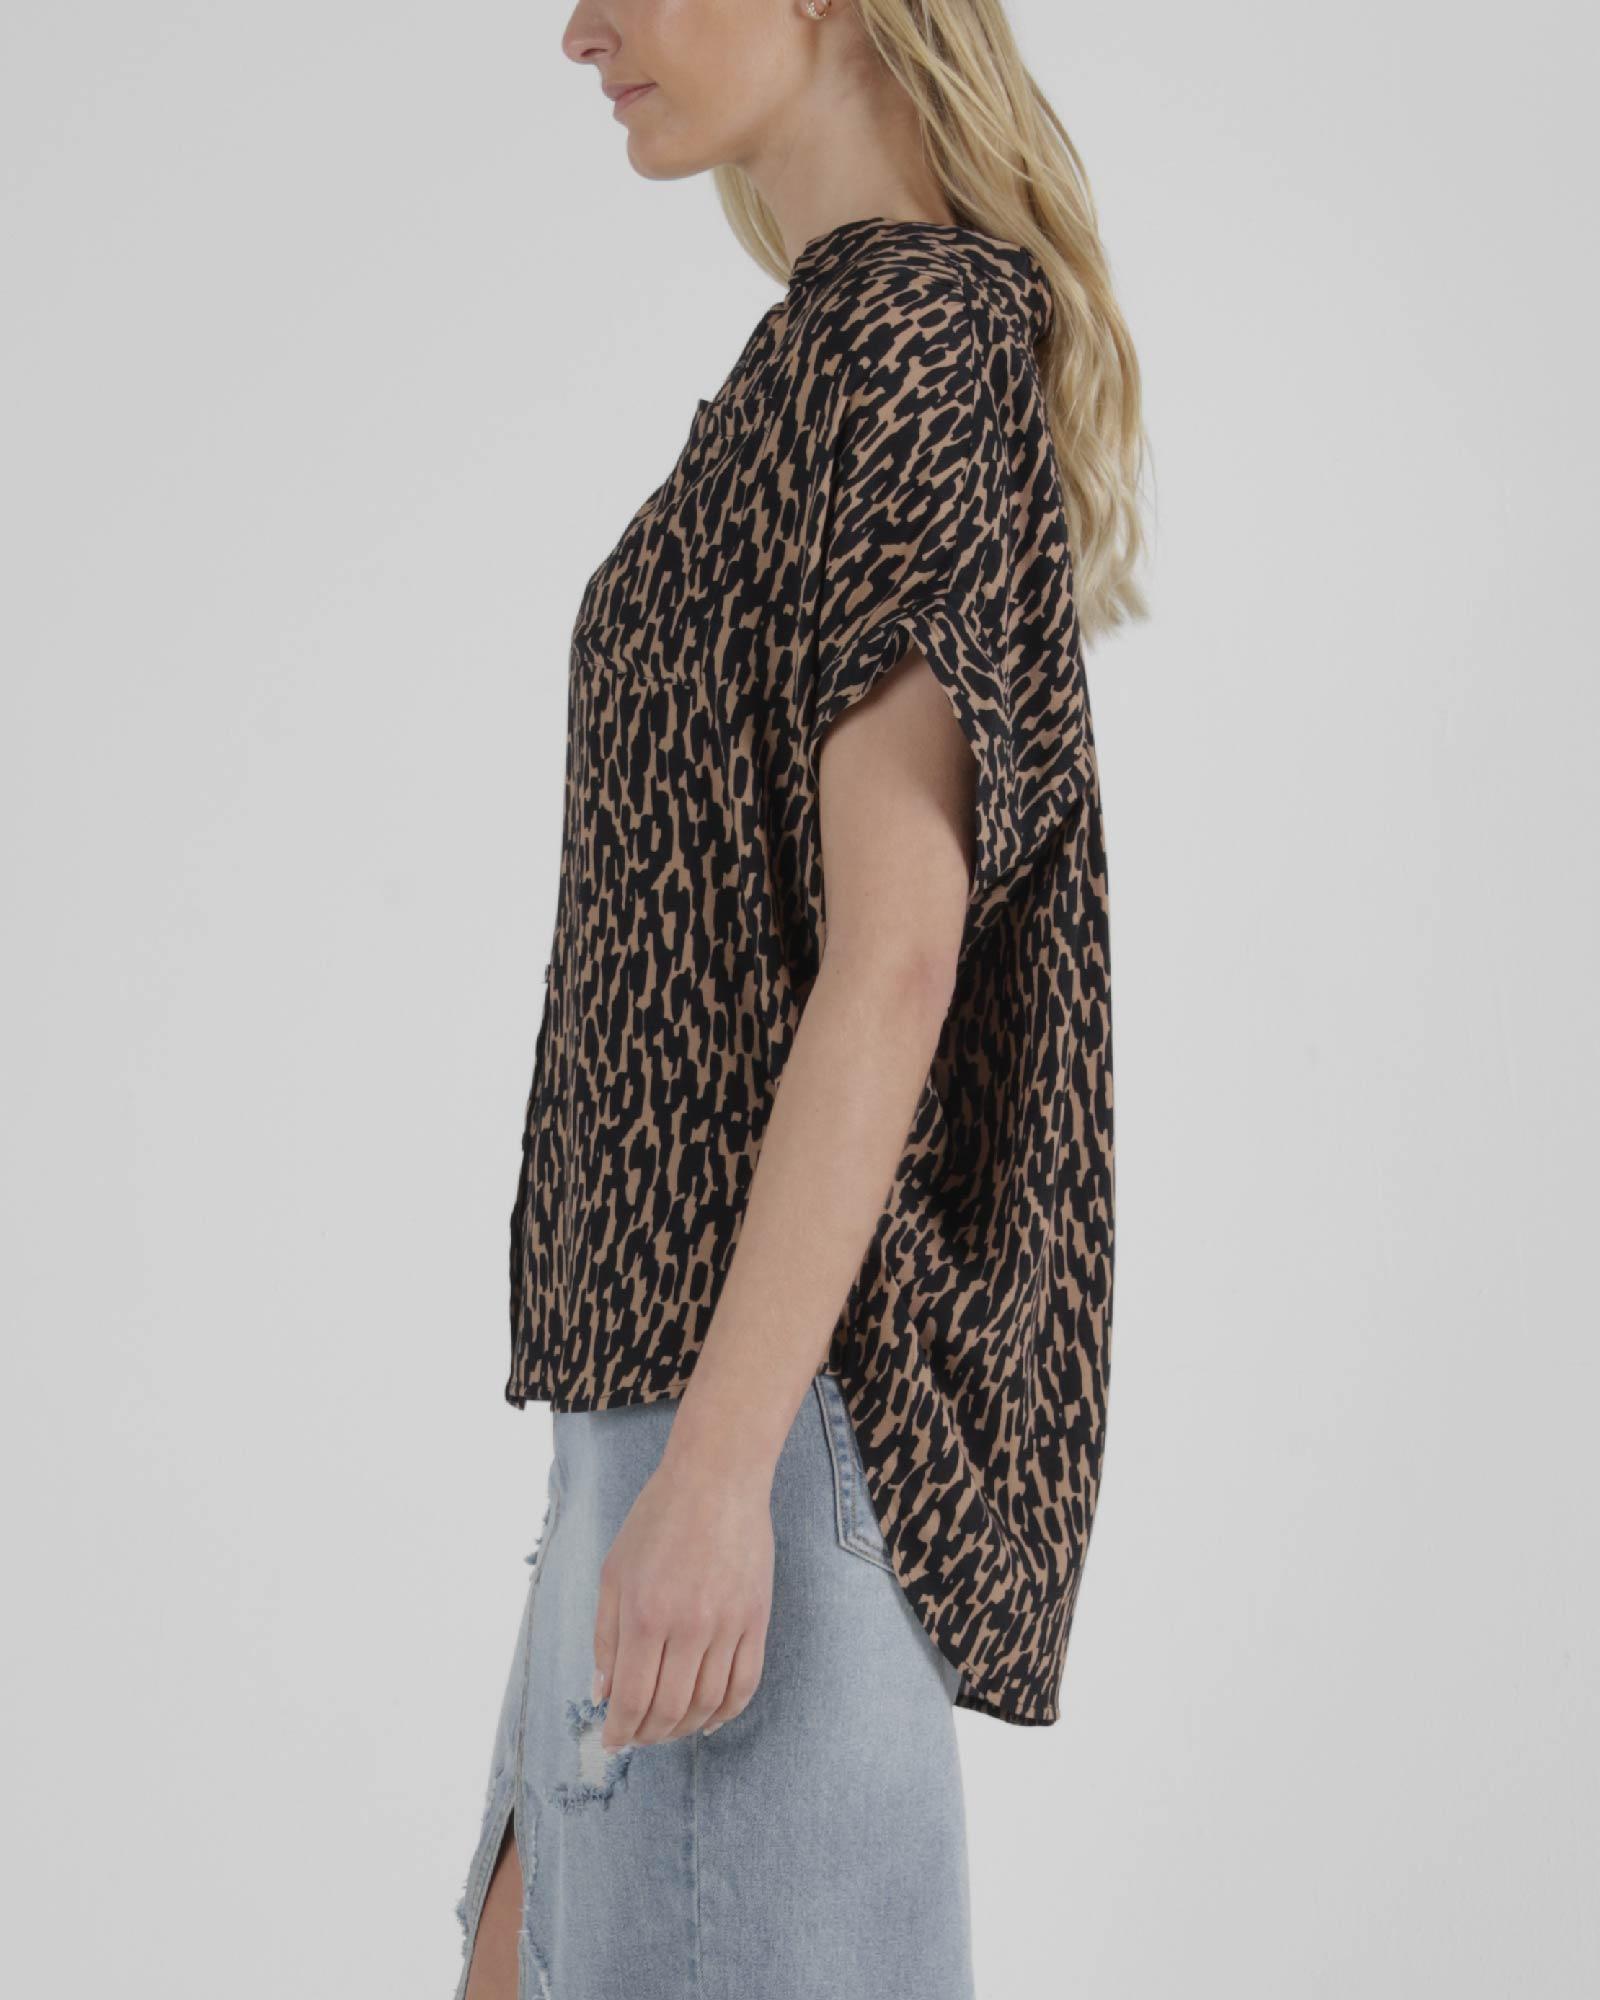 Sass Camille Shirt Animal Print